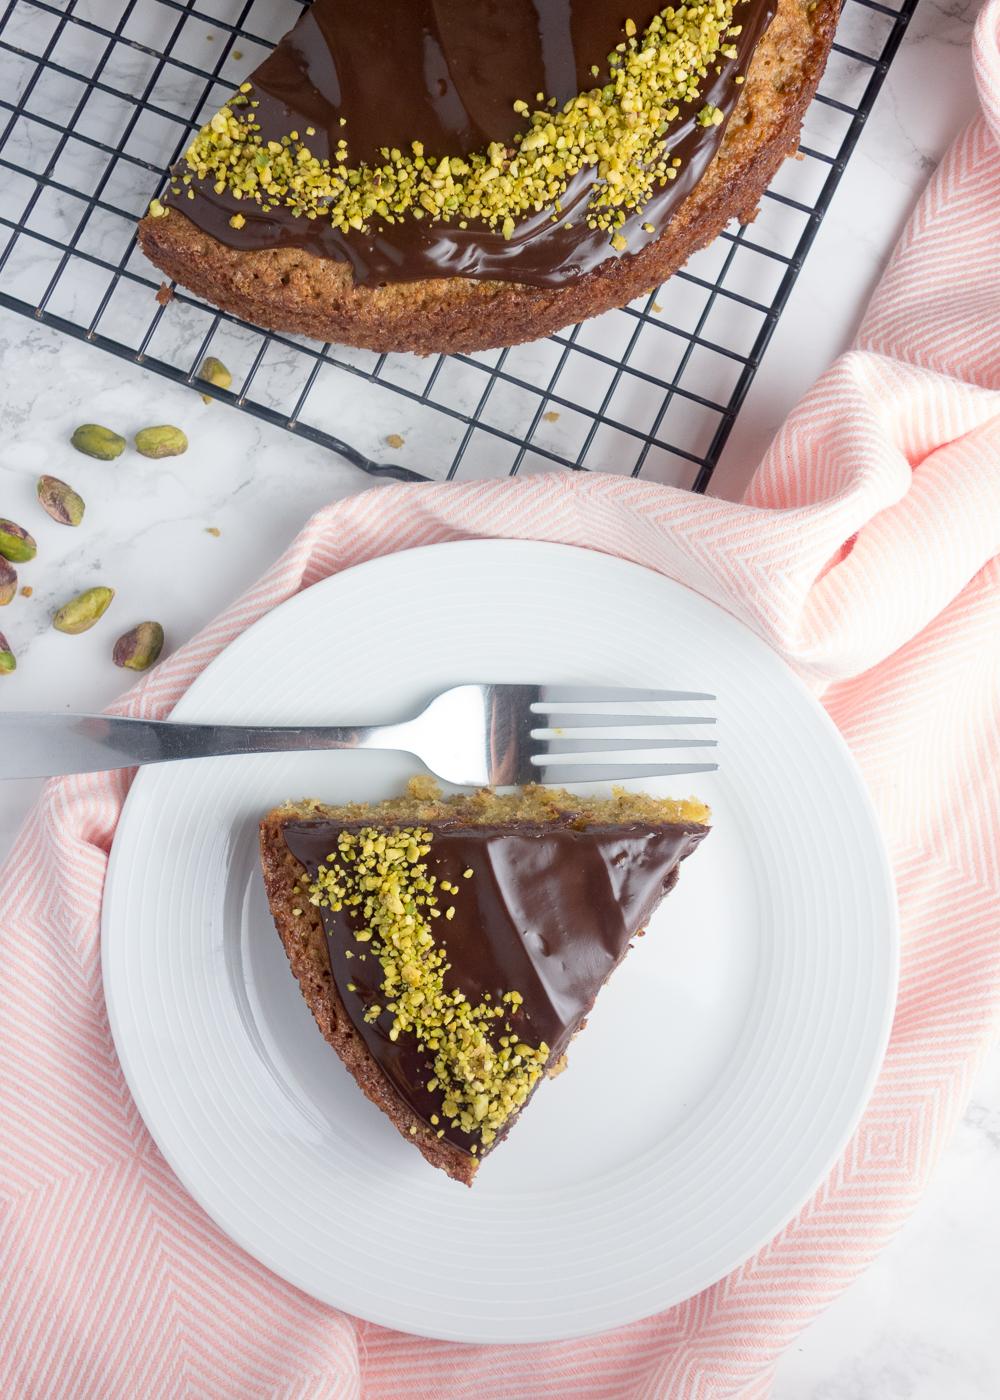 Raspberry Pistachio Topped Chocolate Cake